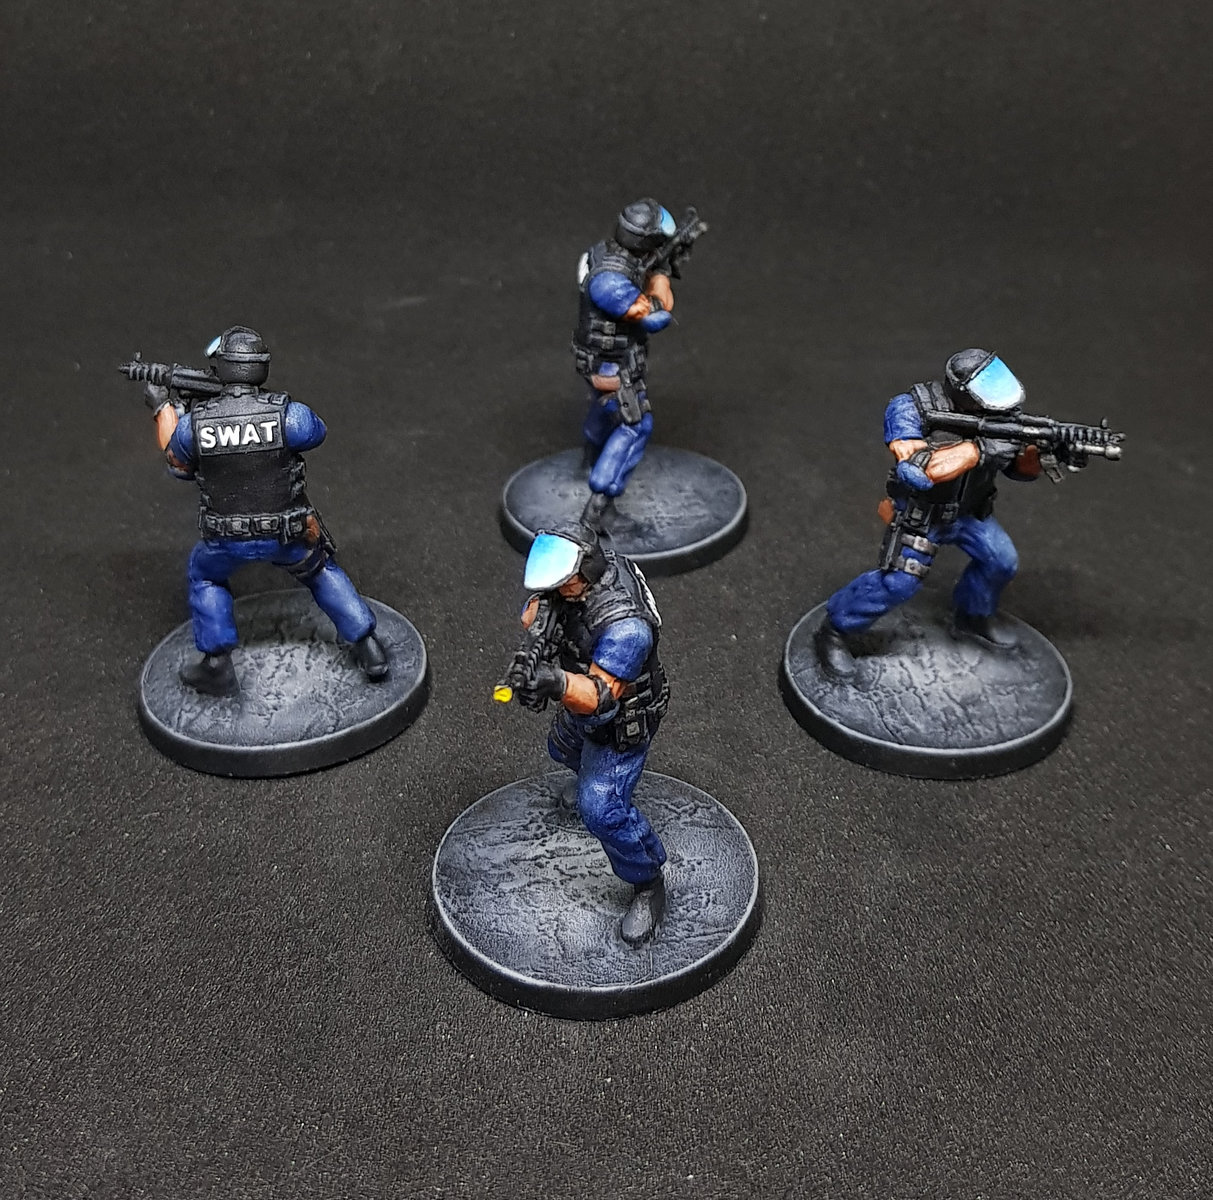 SWATs with Rifle.jpg